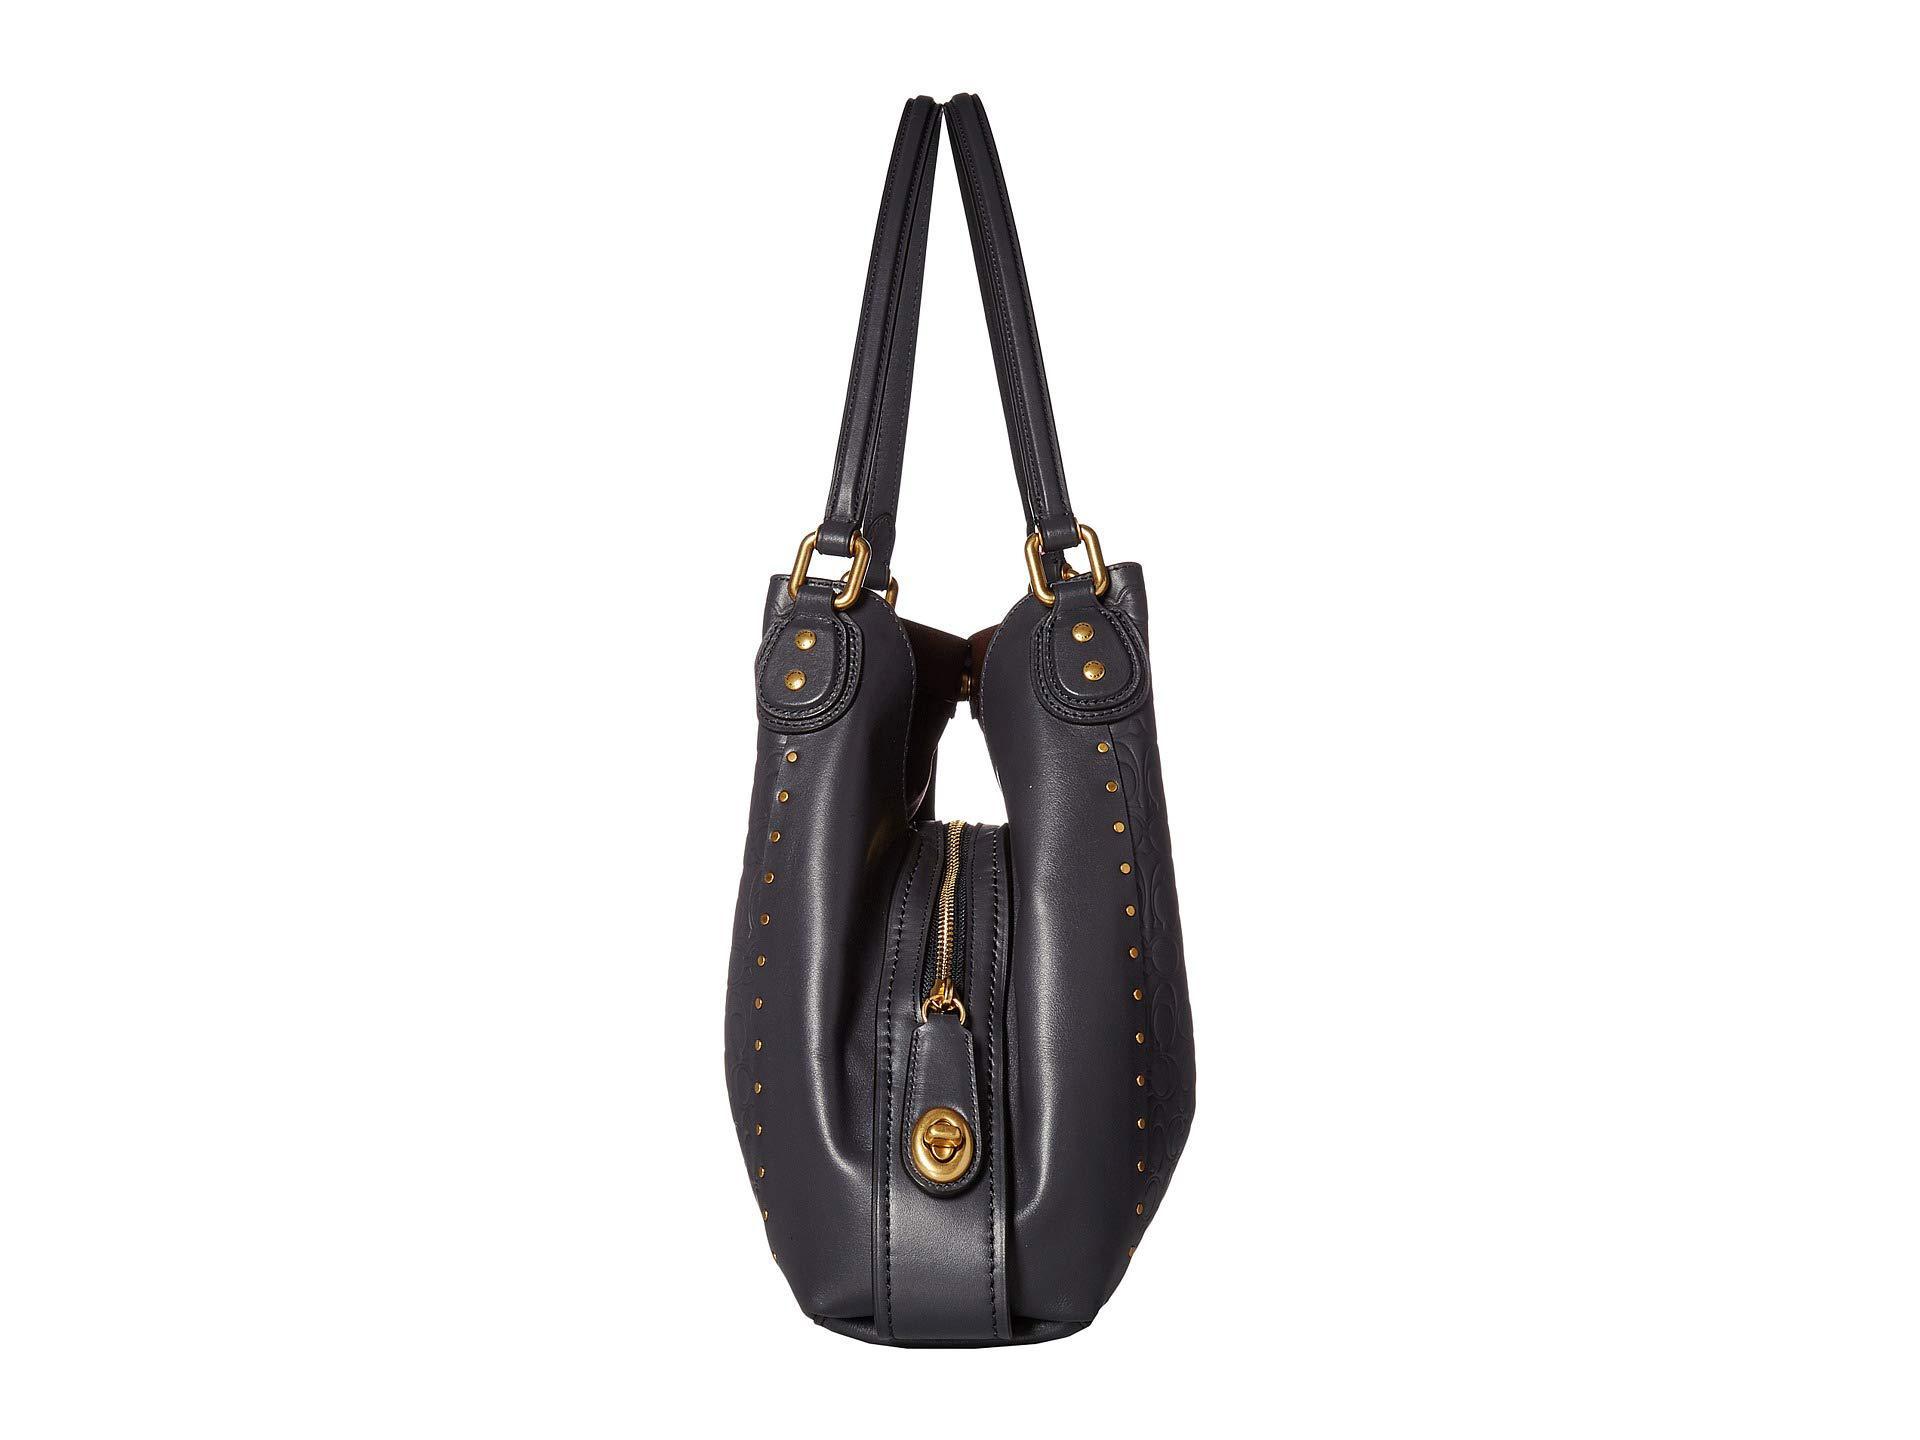 97fa0ec52f7a COACH - Black Edie 31 Shoulder Bag In Signature Leather (b4 midnight Navy).  View fullscreen